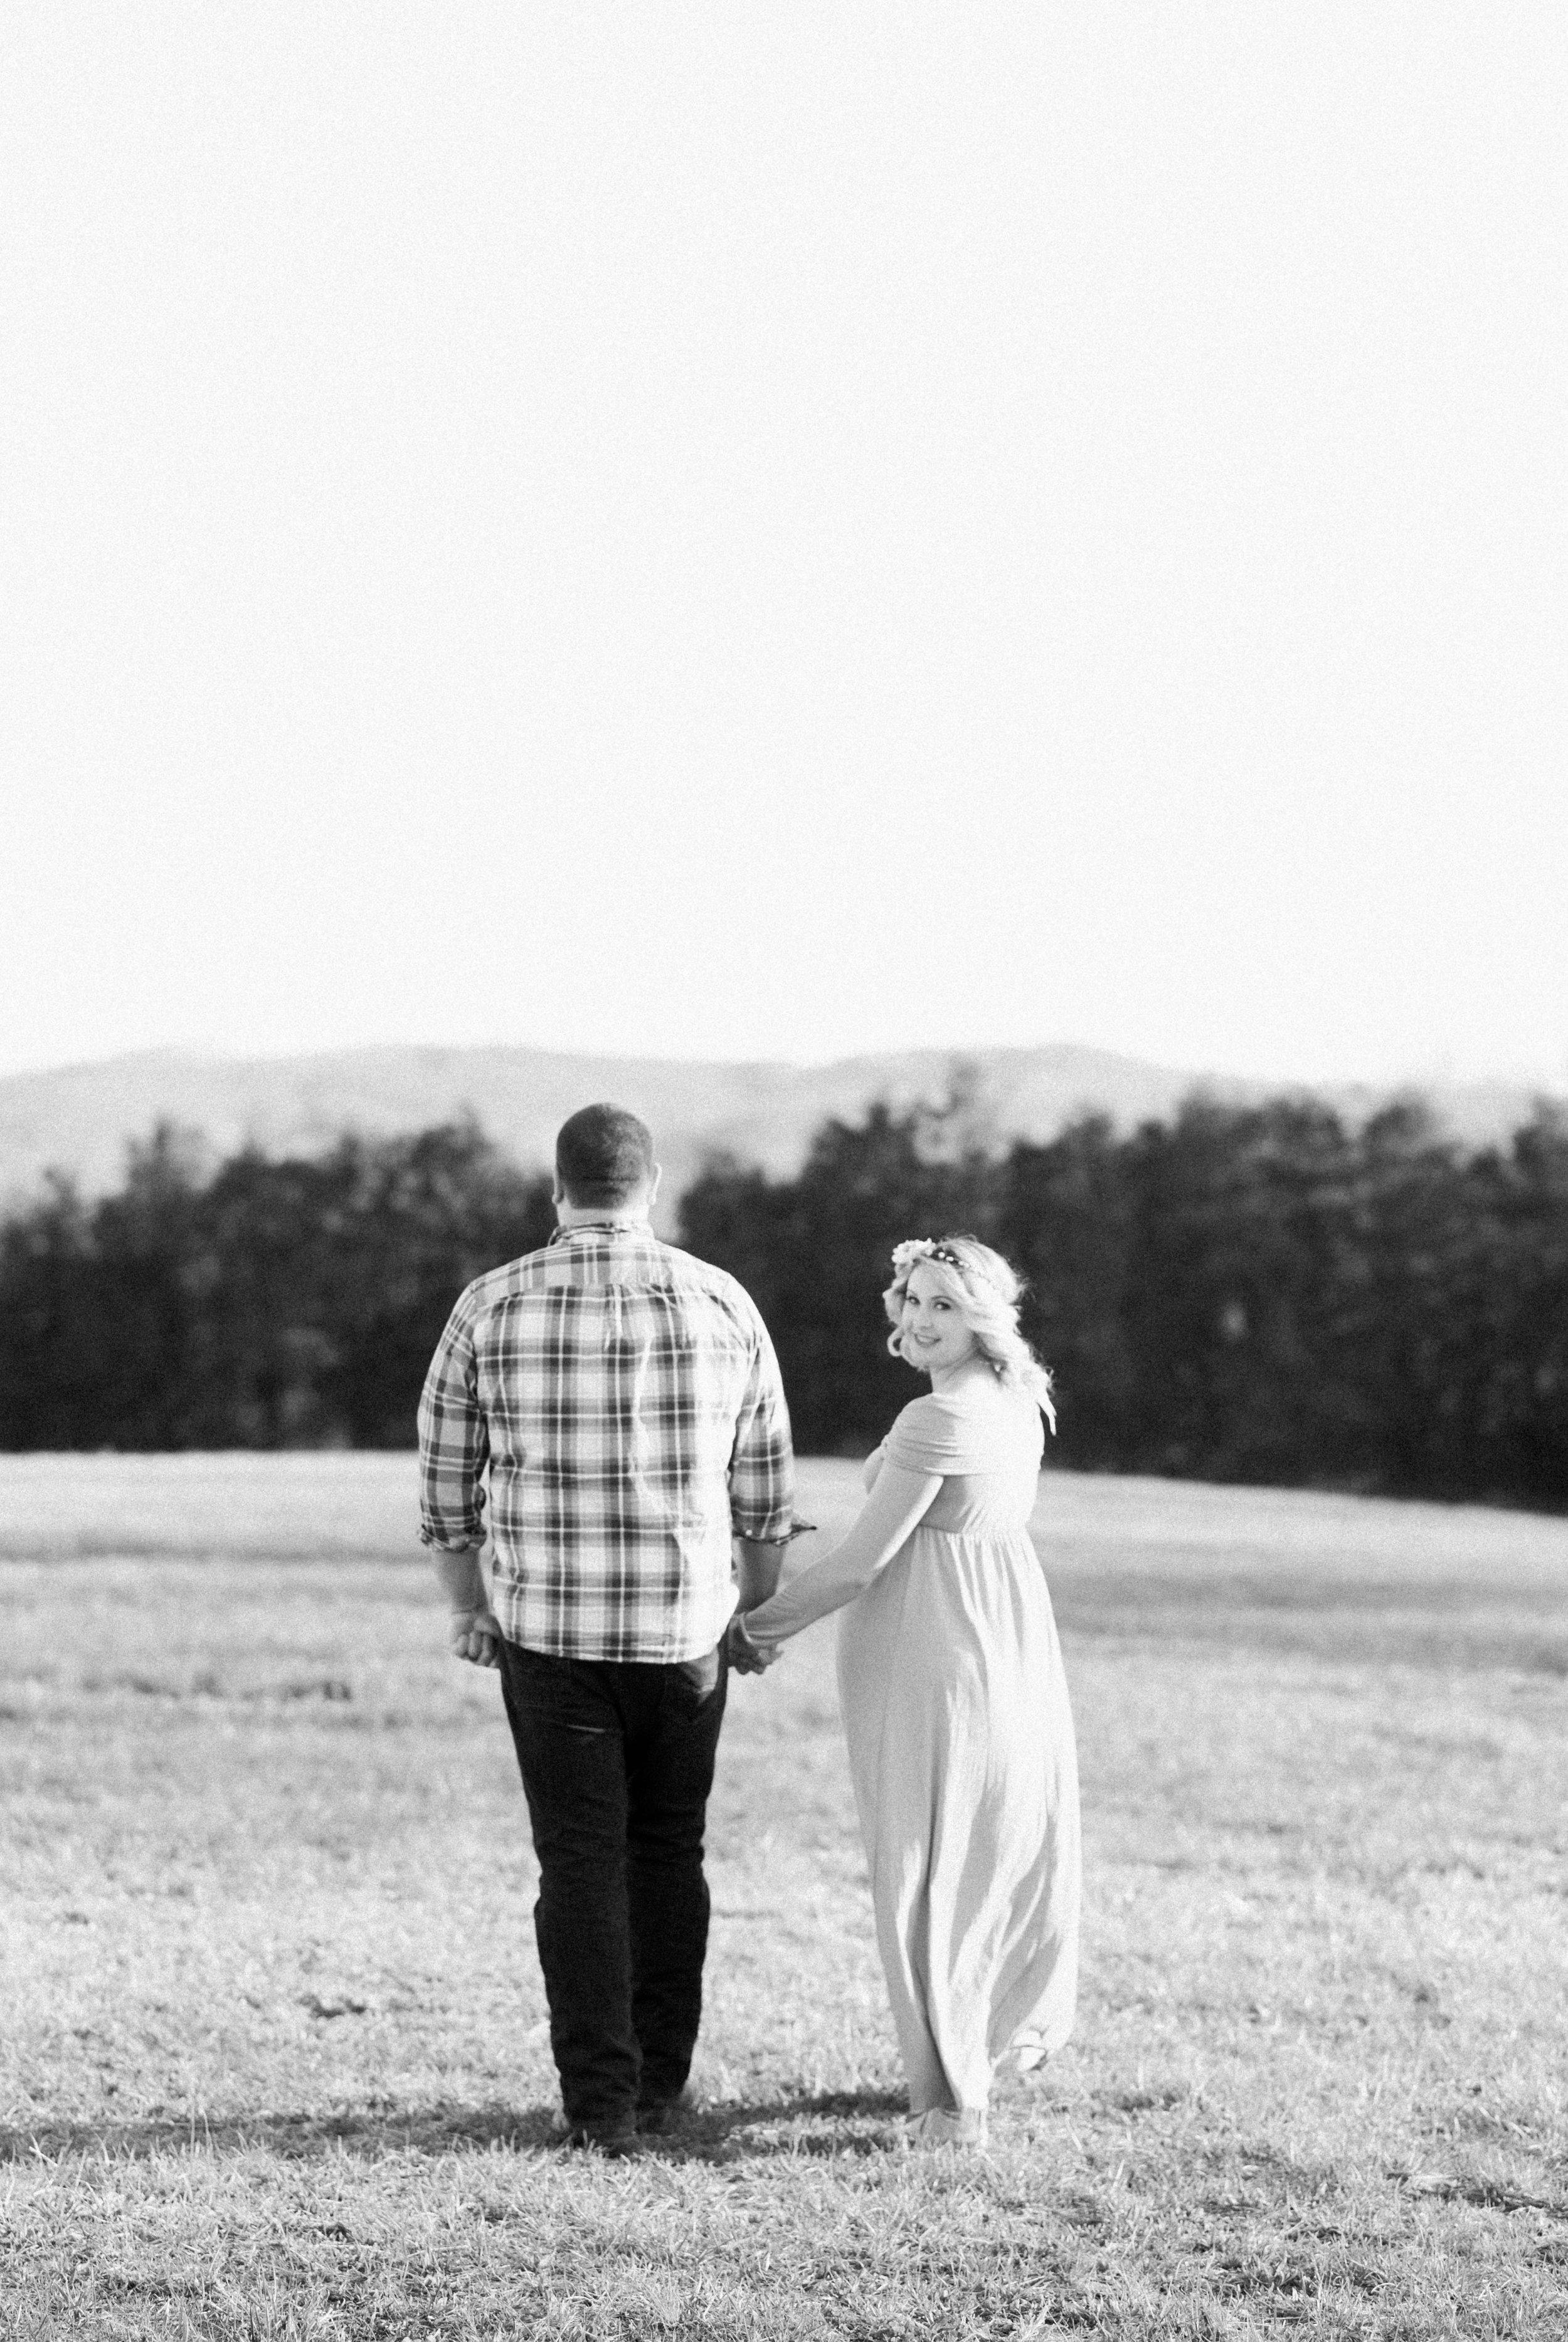 SorellaFarms_Jessica+Dylan_MaternitySession_Virginiaweddingphotographer 24.jpg